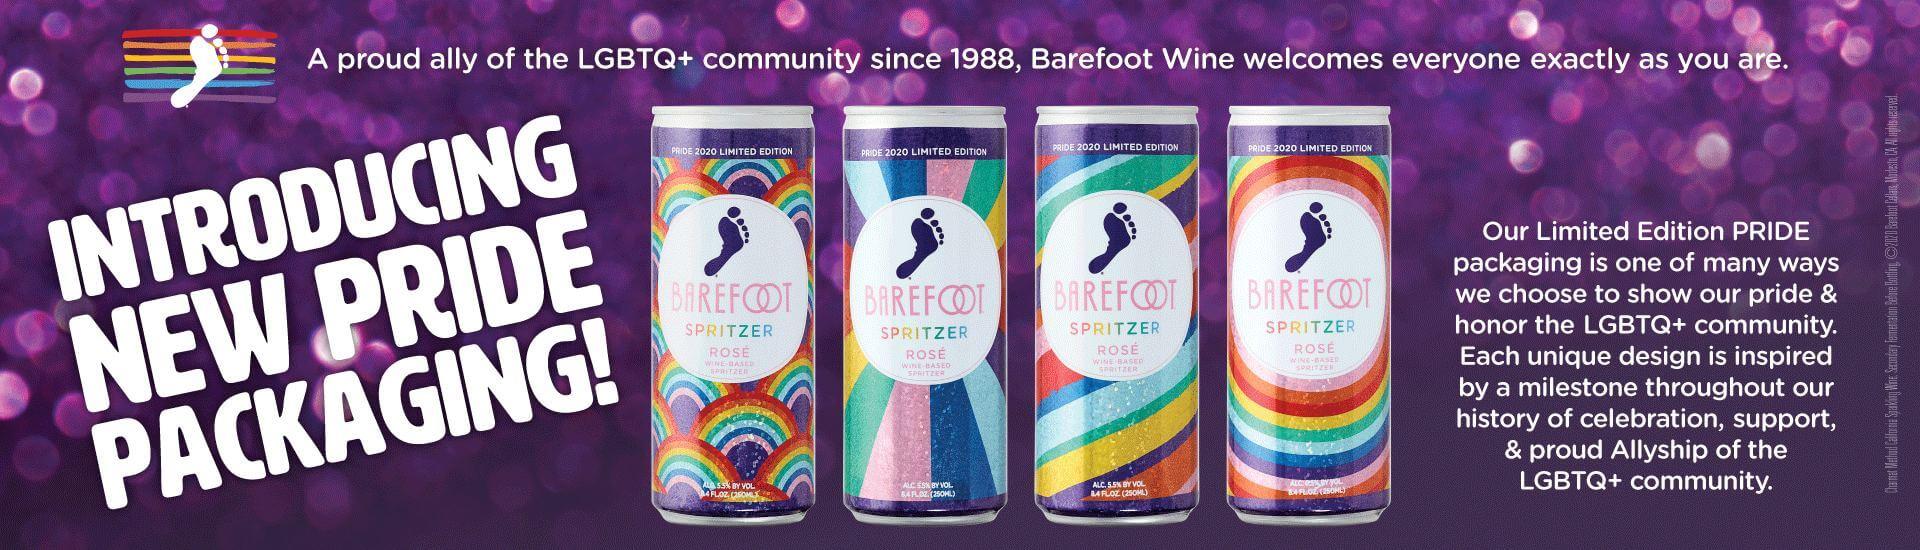 Premiere Banner - Barefoot